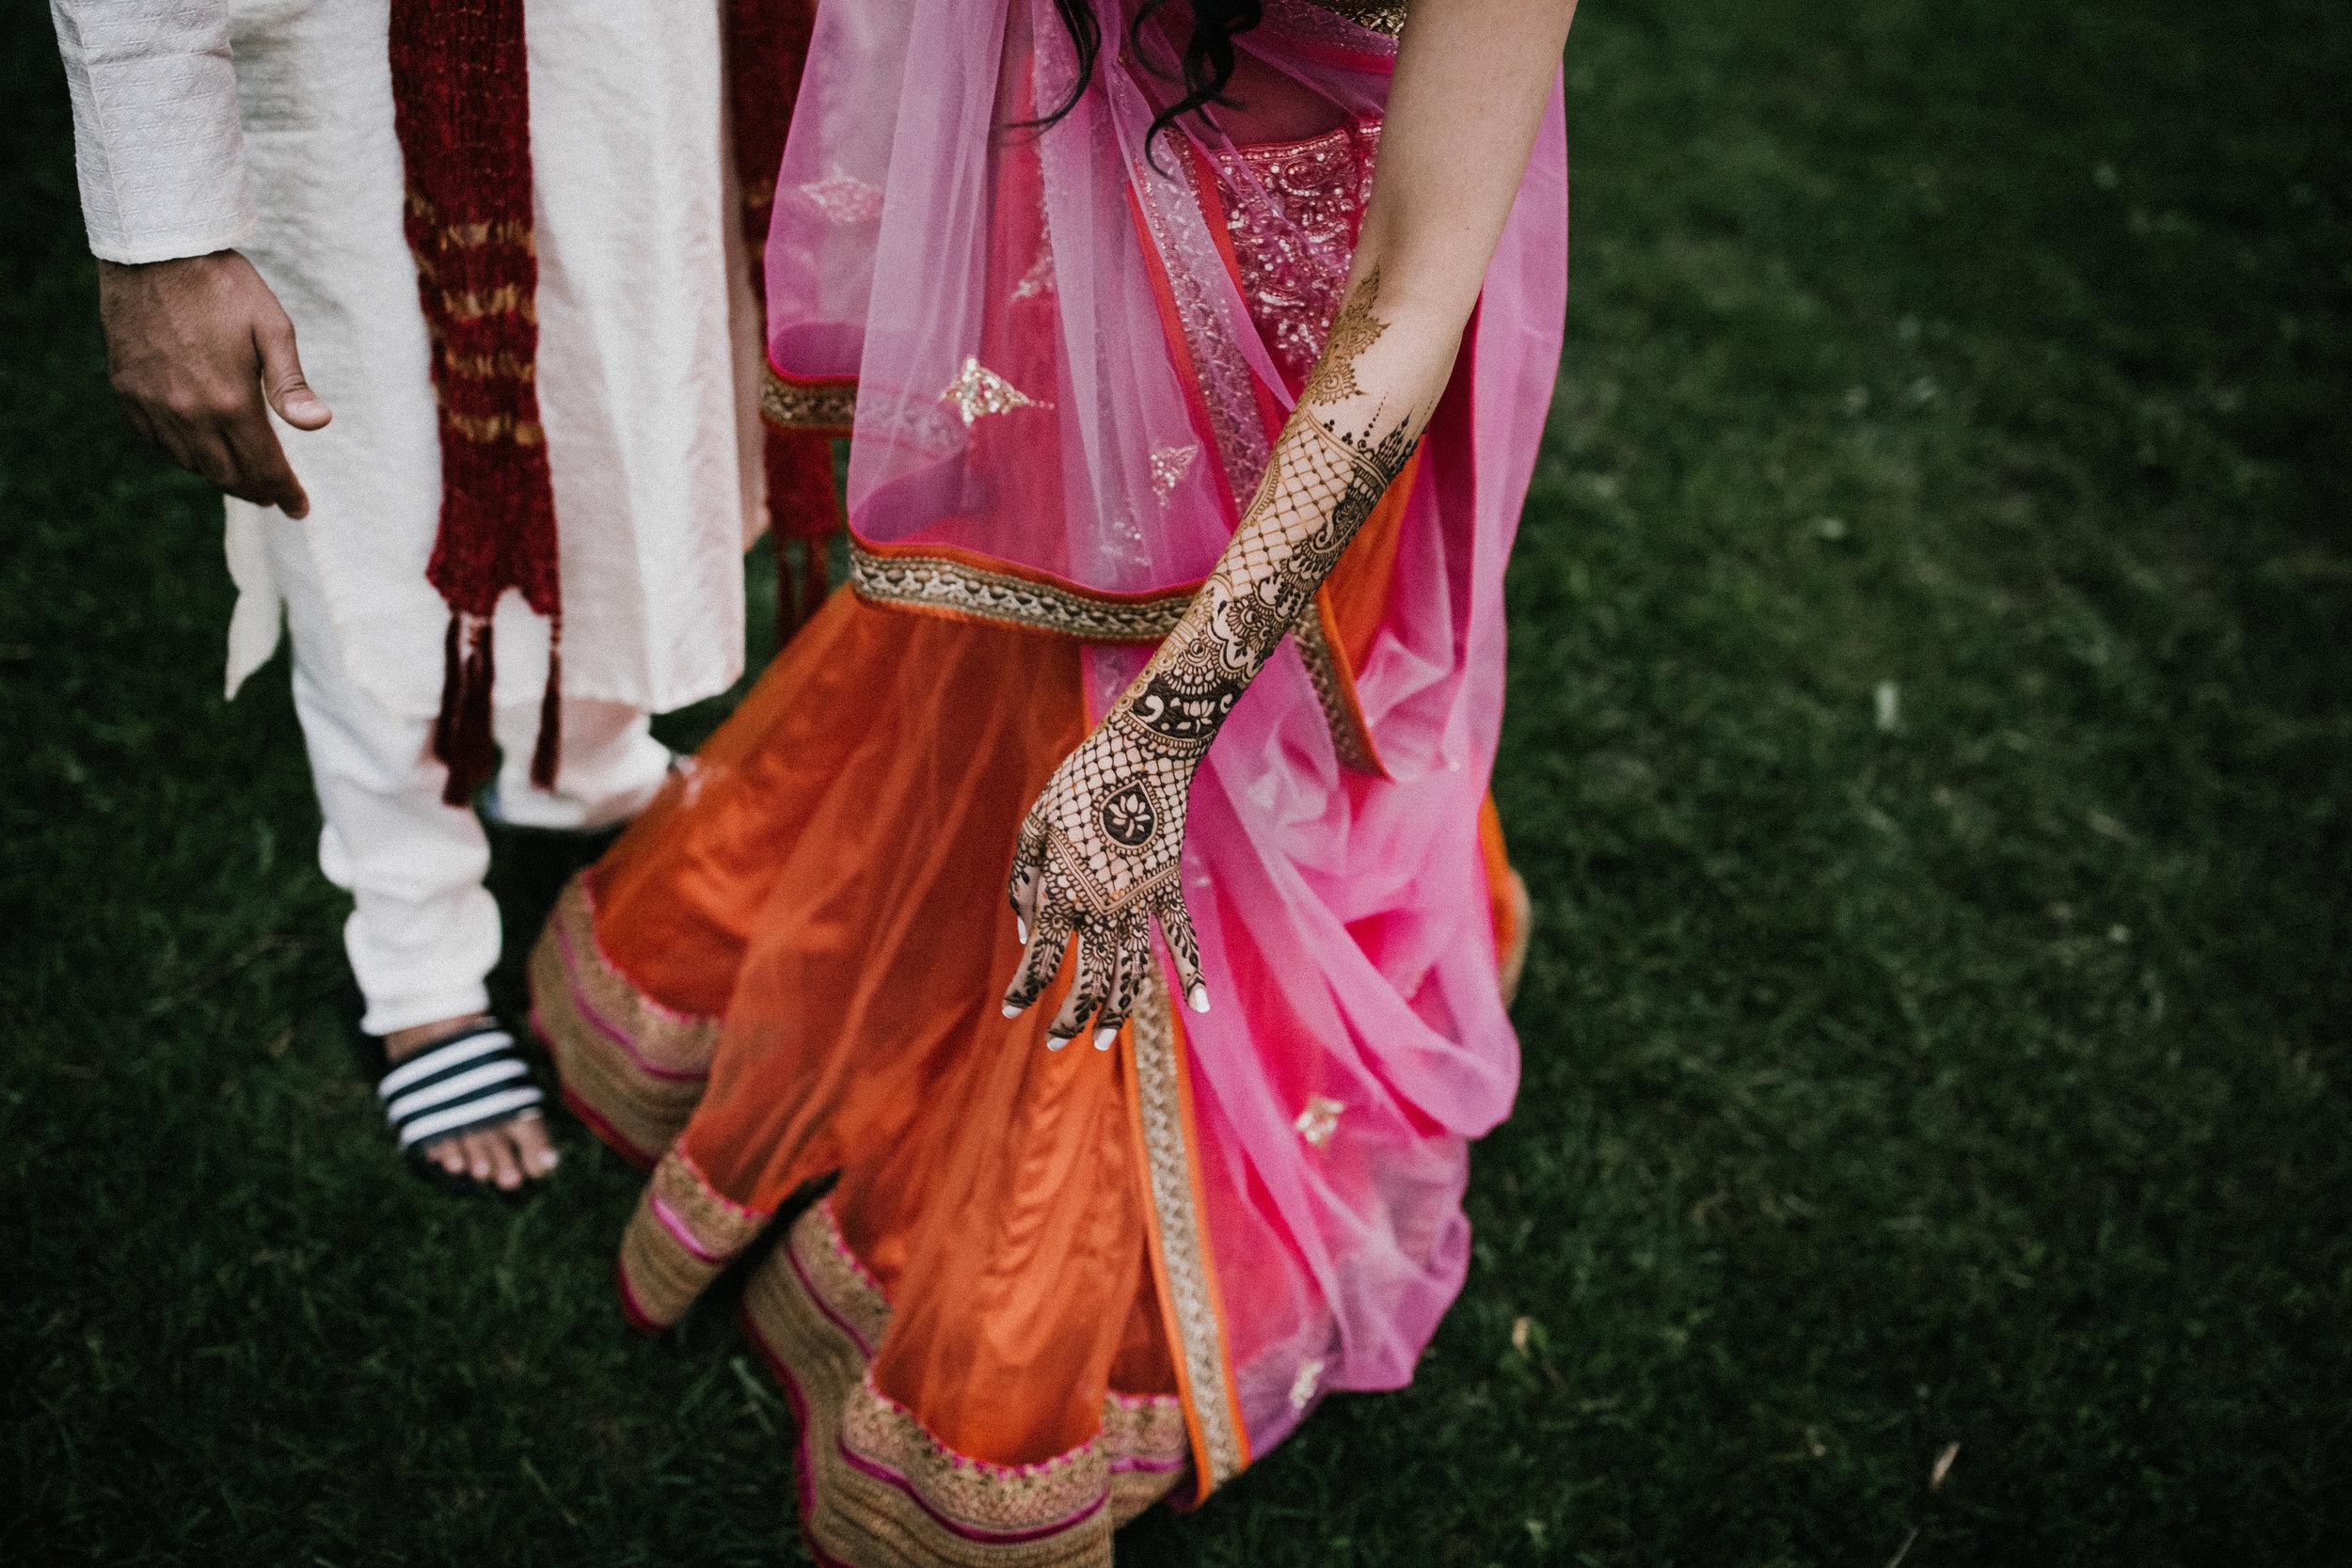 Aparna-Ankit-Patel-Mehndi-Wedding-Photos-0079.jpg